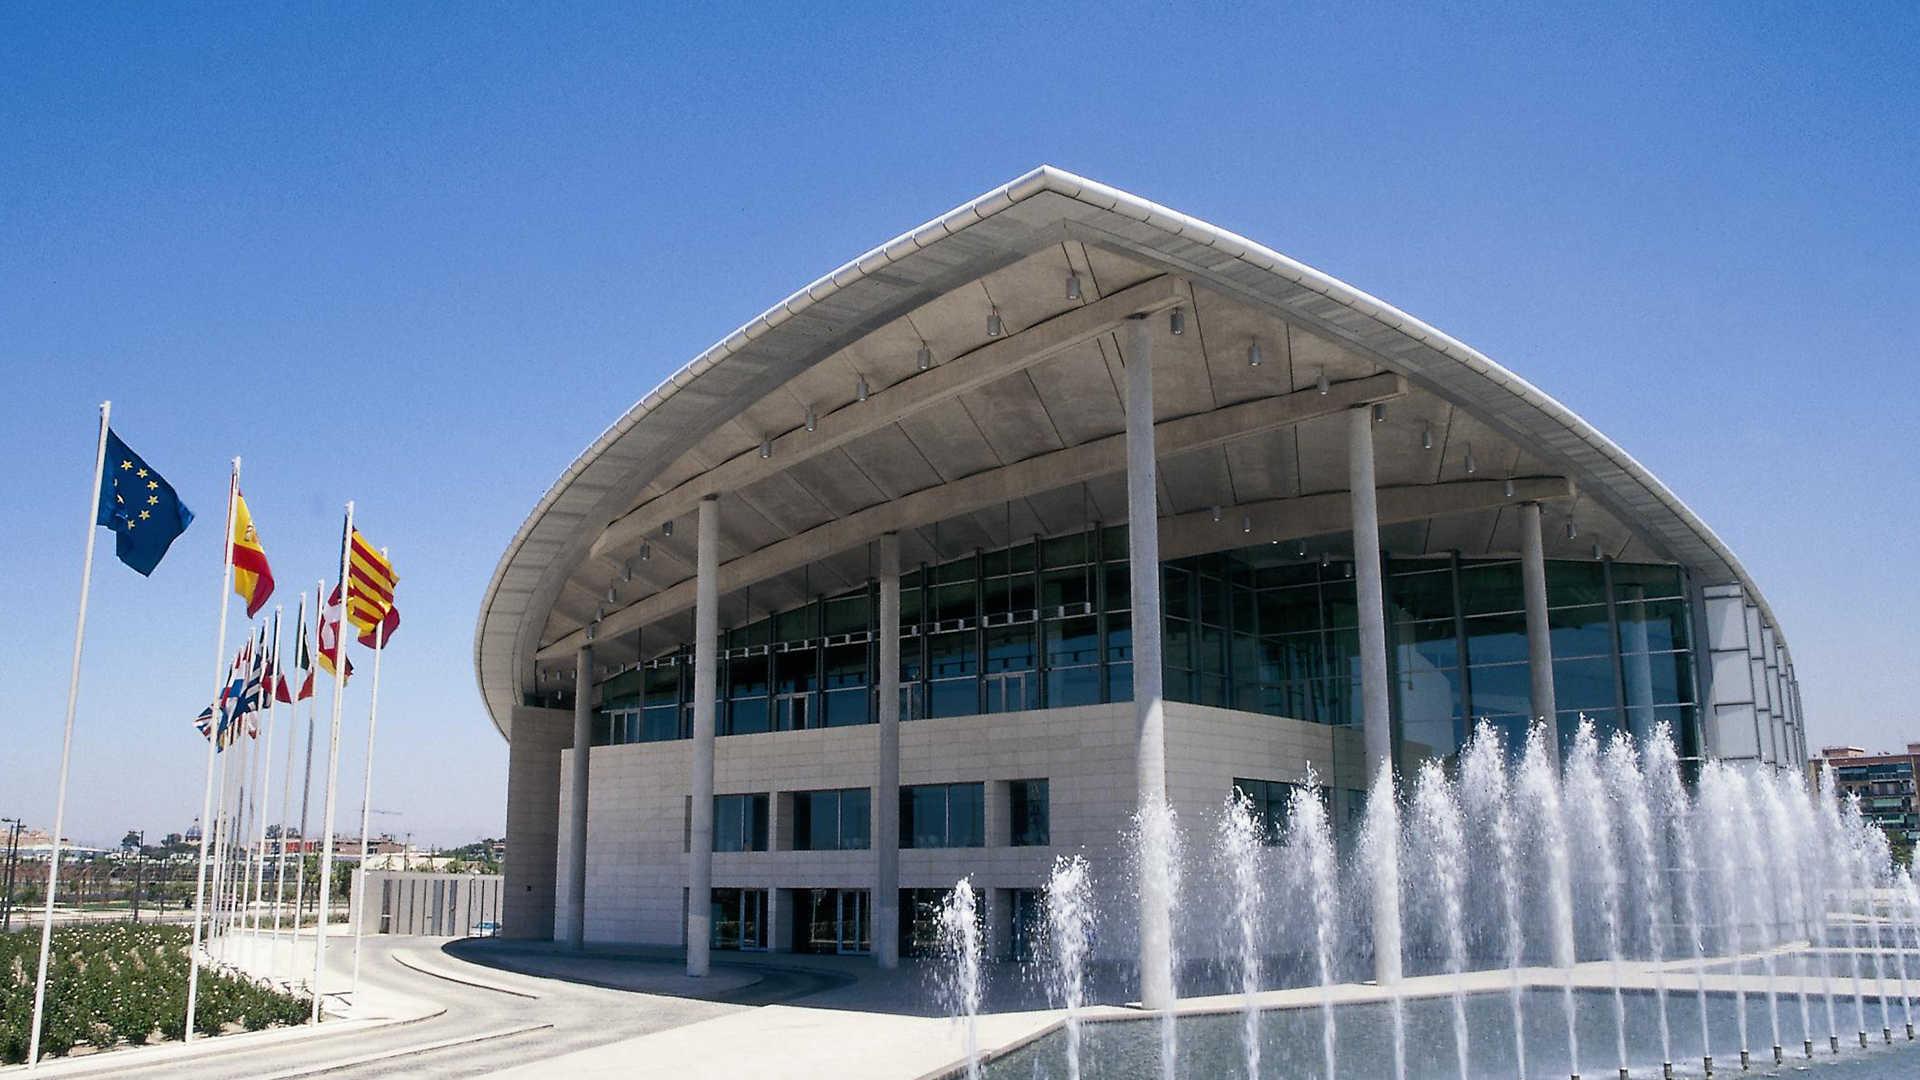 València Convention Bureau